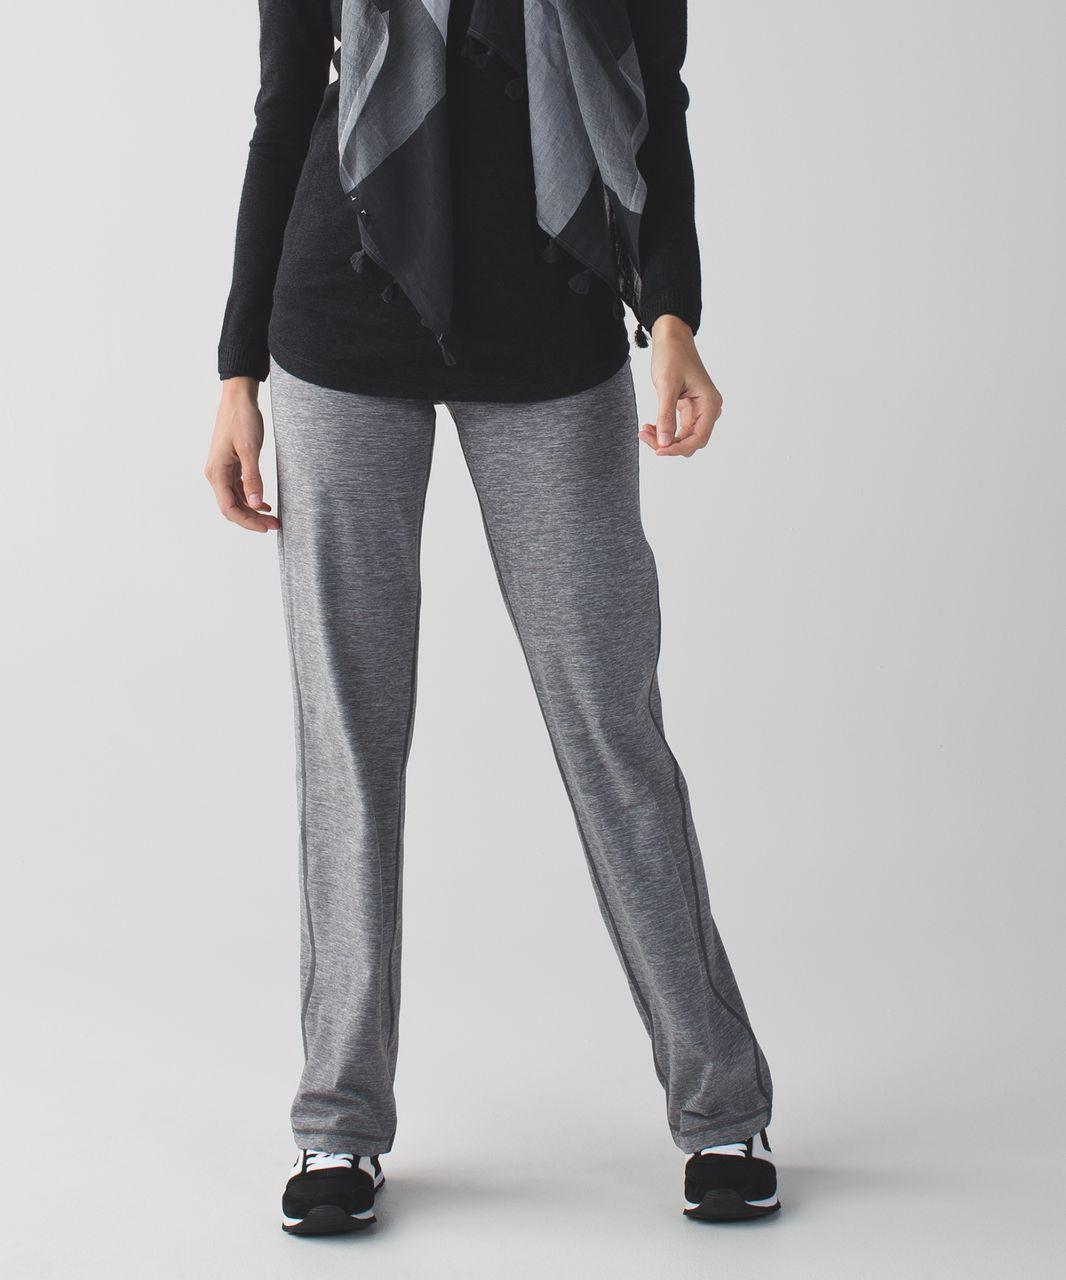 Lululemon Relaxed Fit Pant - Heathered Slate